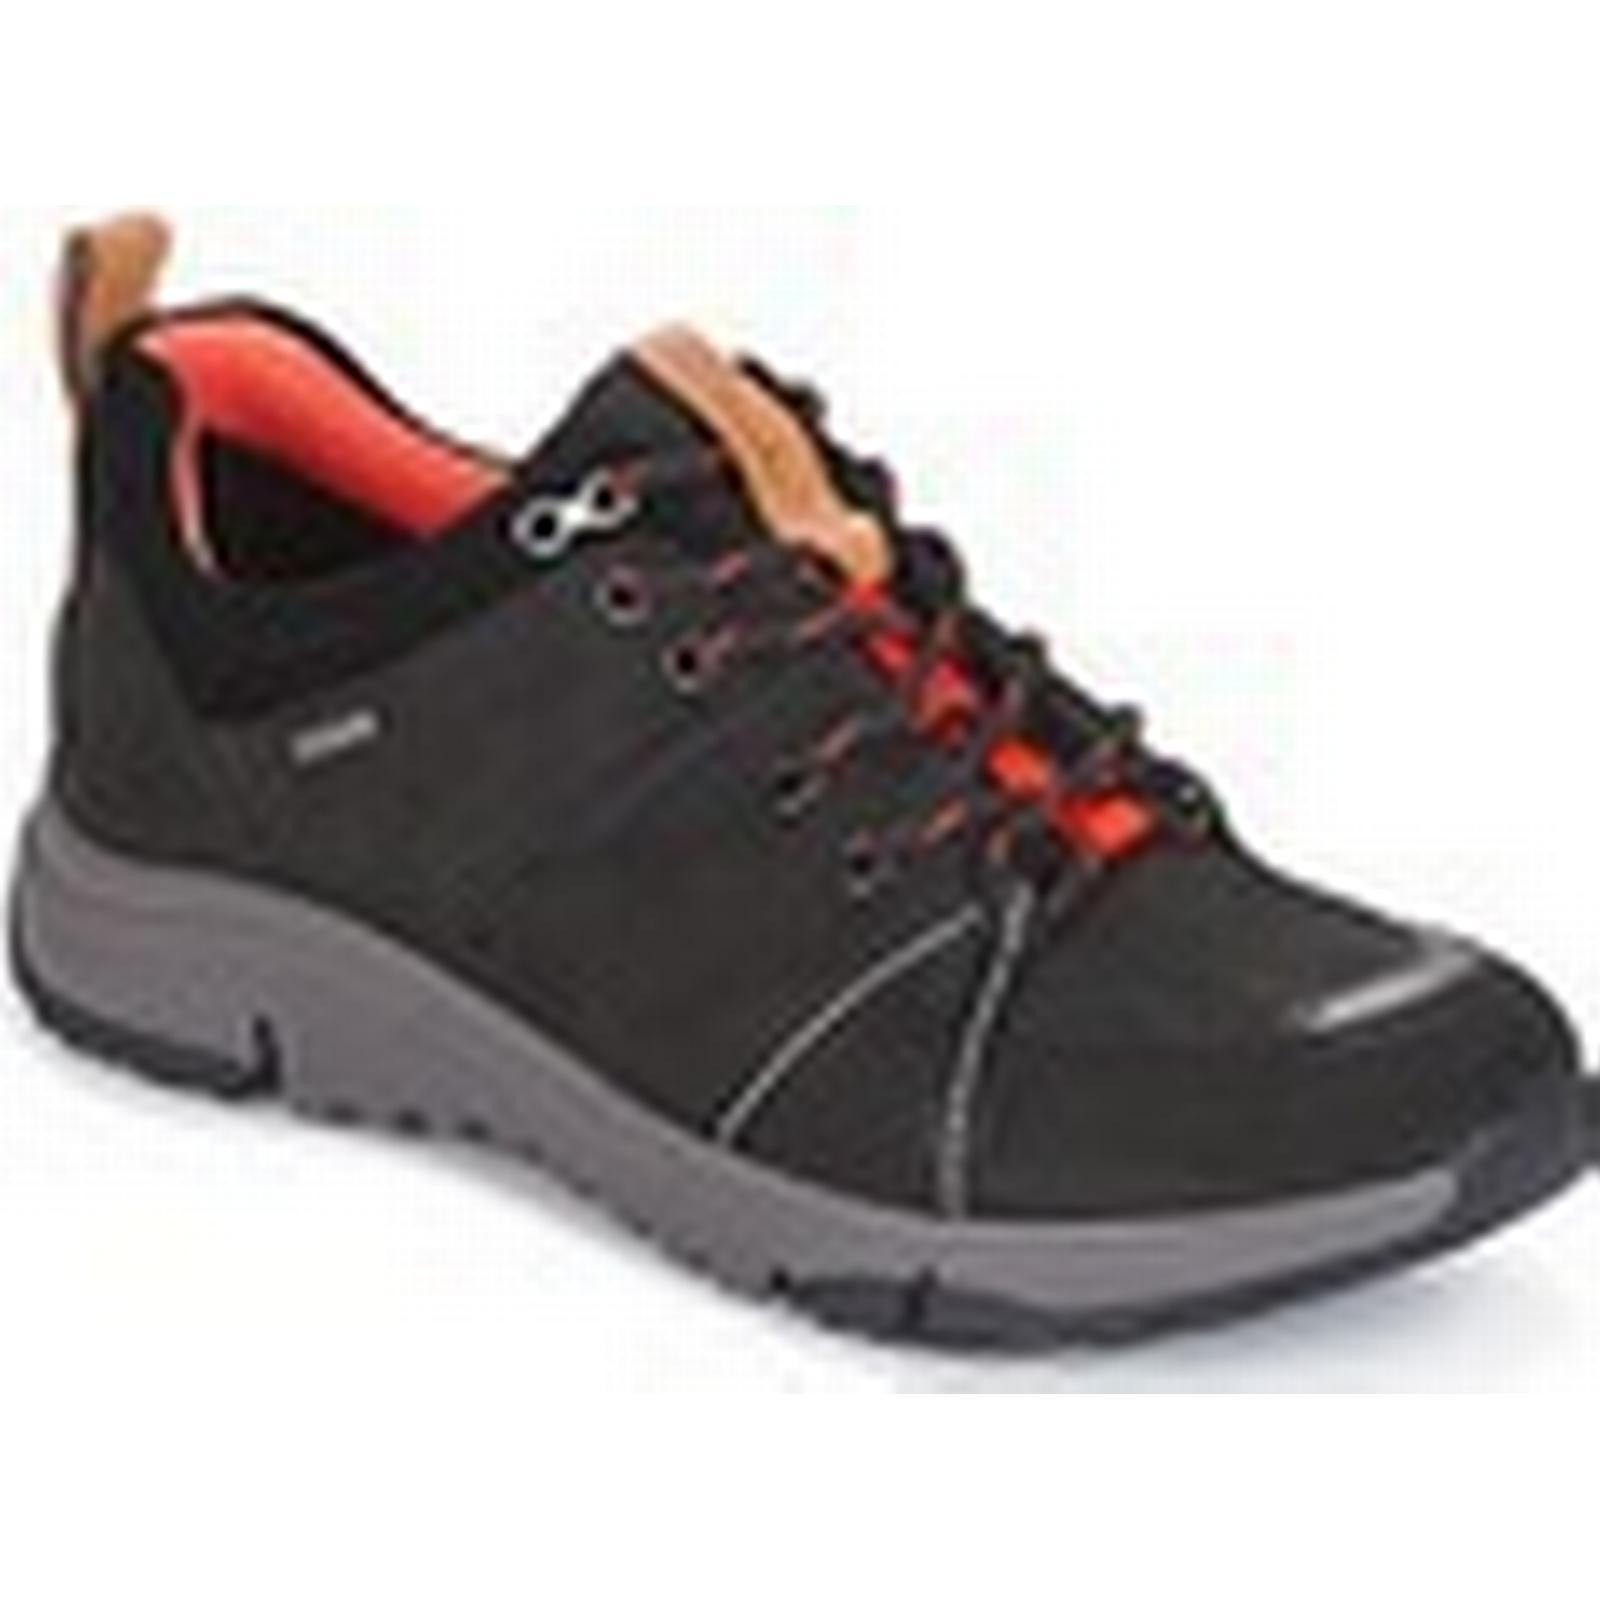 Clarks Black  TRI TREK  women's Shoes (Trainers) in Black Clarks 83d55d